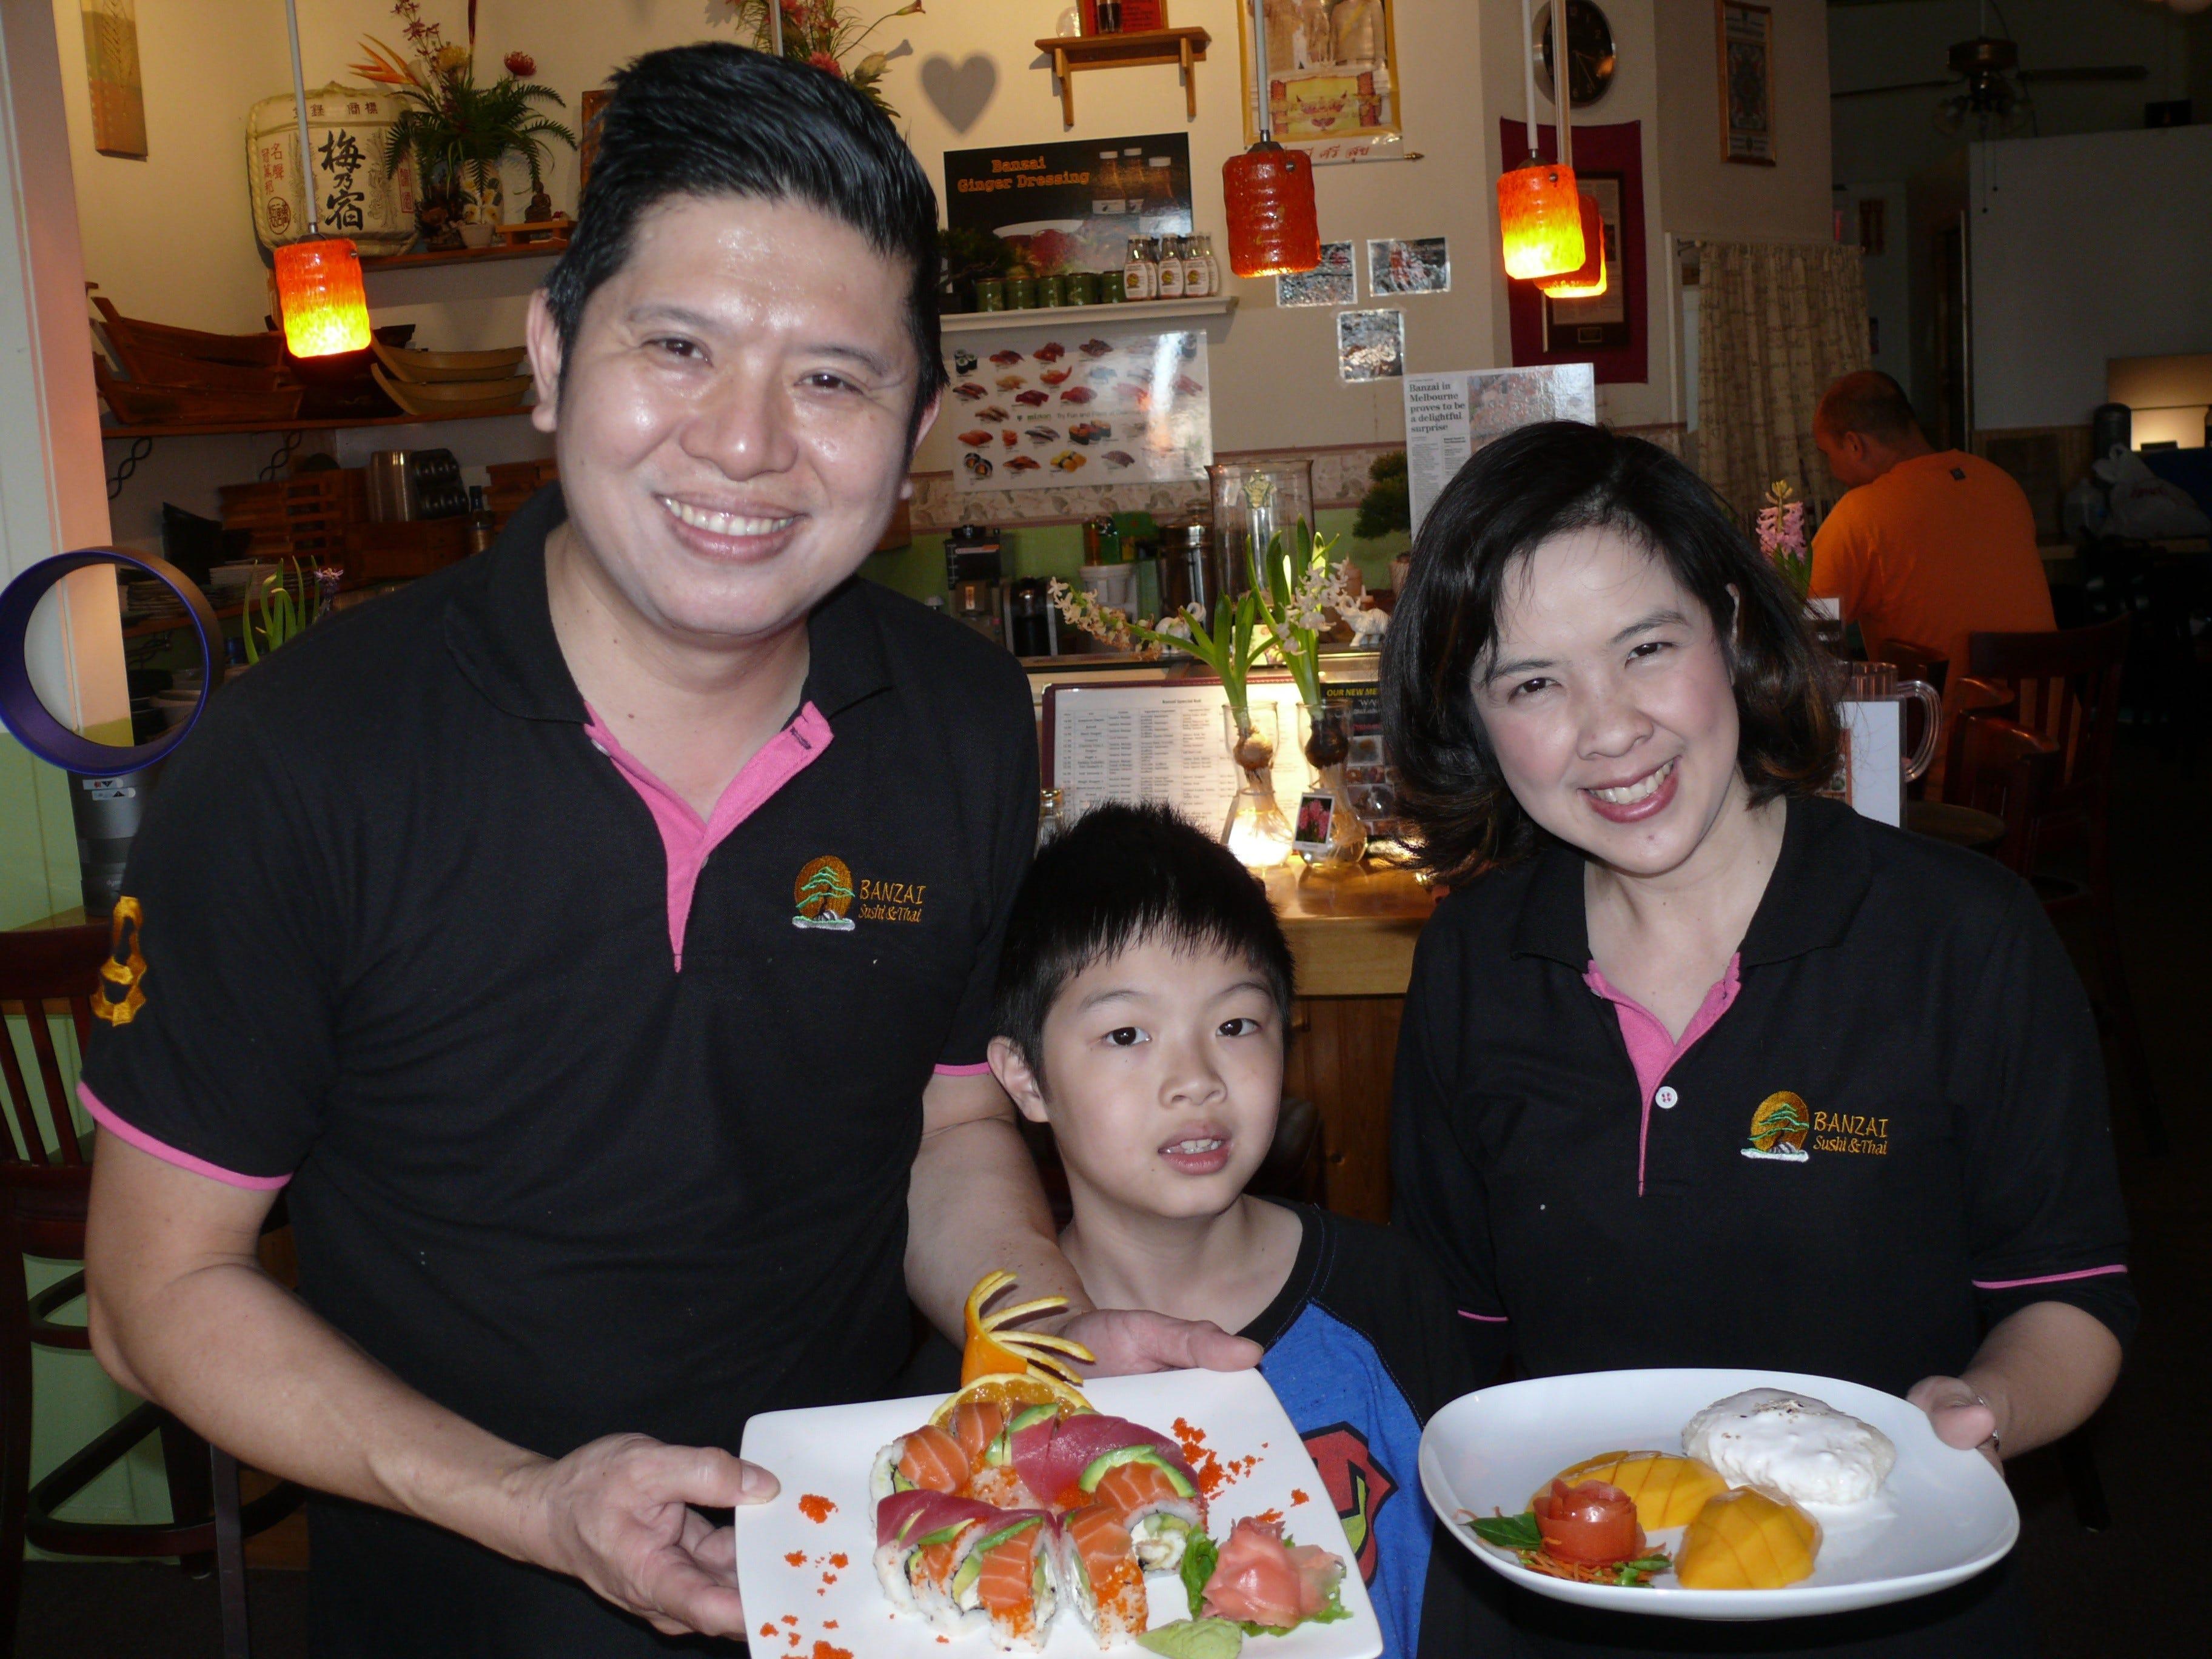 636563621799052314-Bonzai Join the family at Banzai Sushi & Thai on Lake Washington in Melbourne